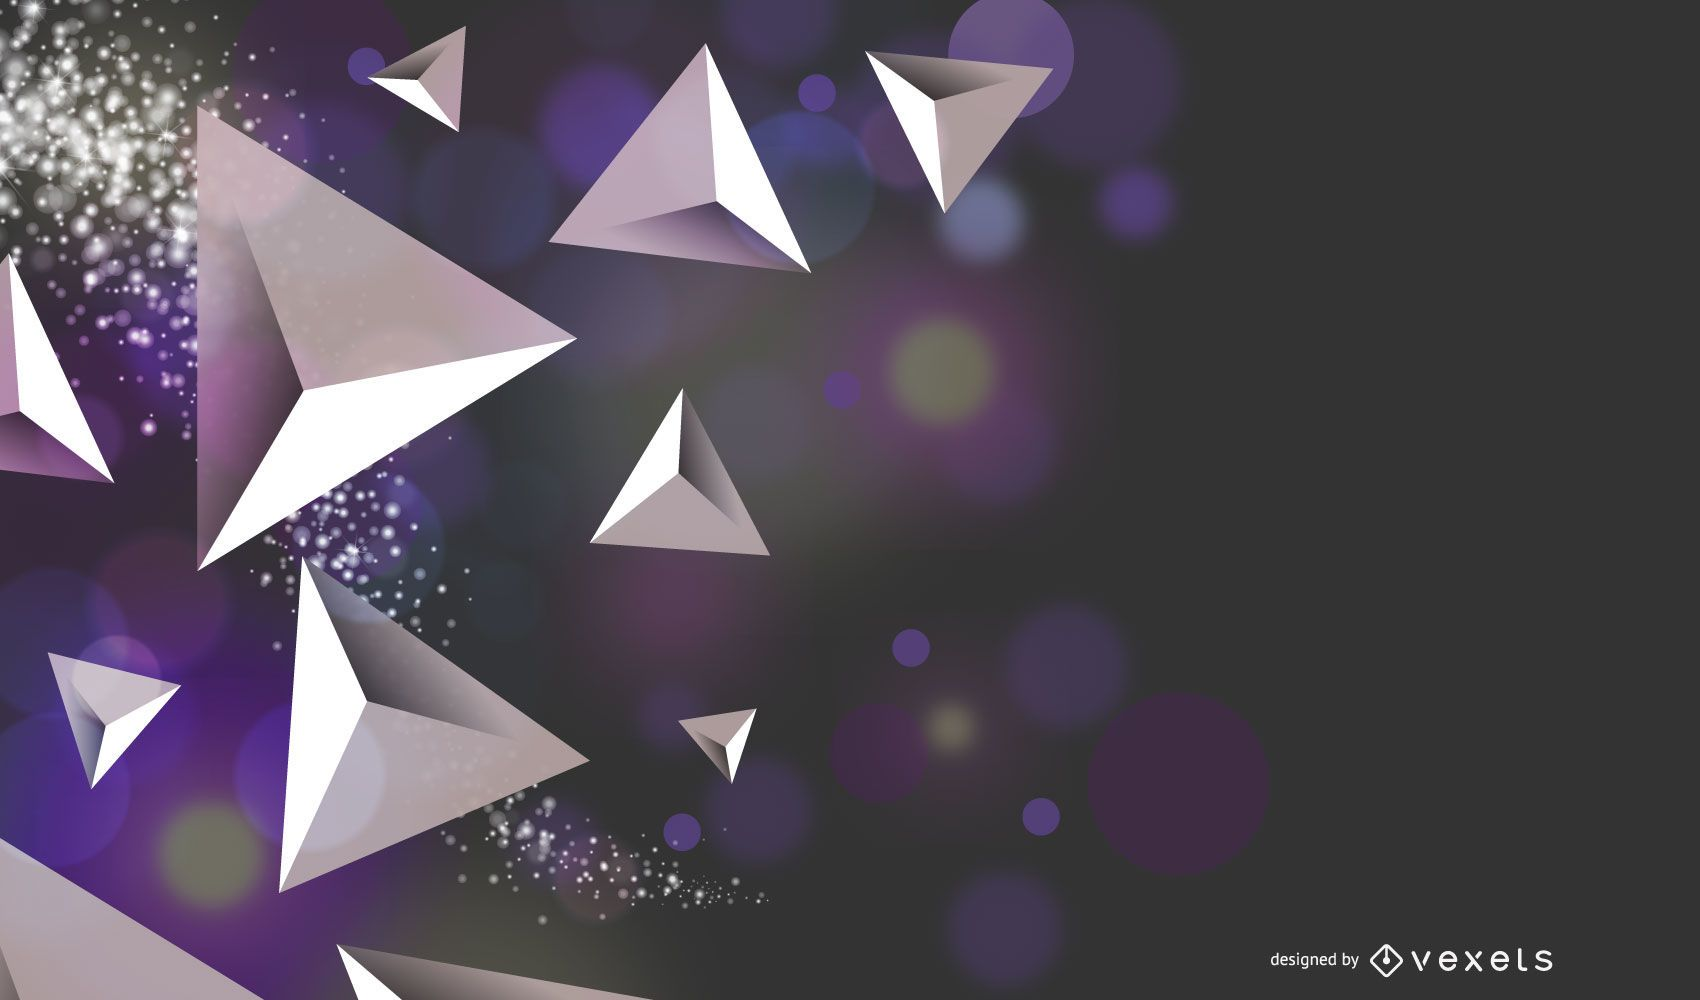 Abstract 3D Pyramid Vector Design